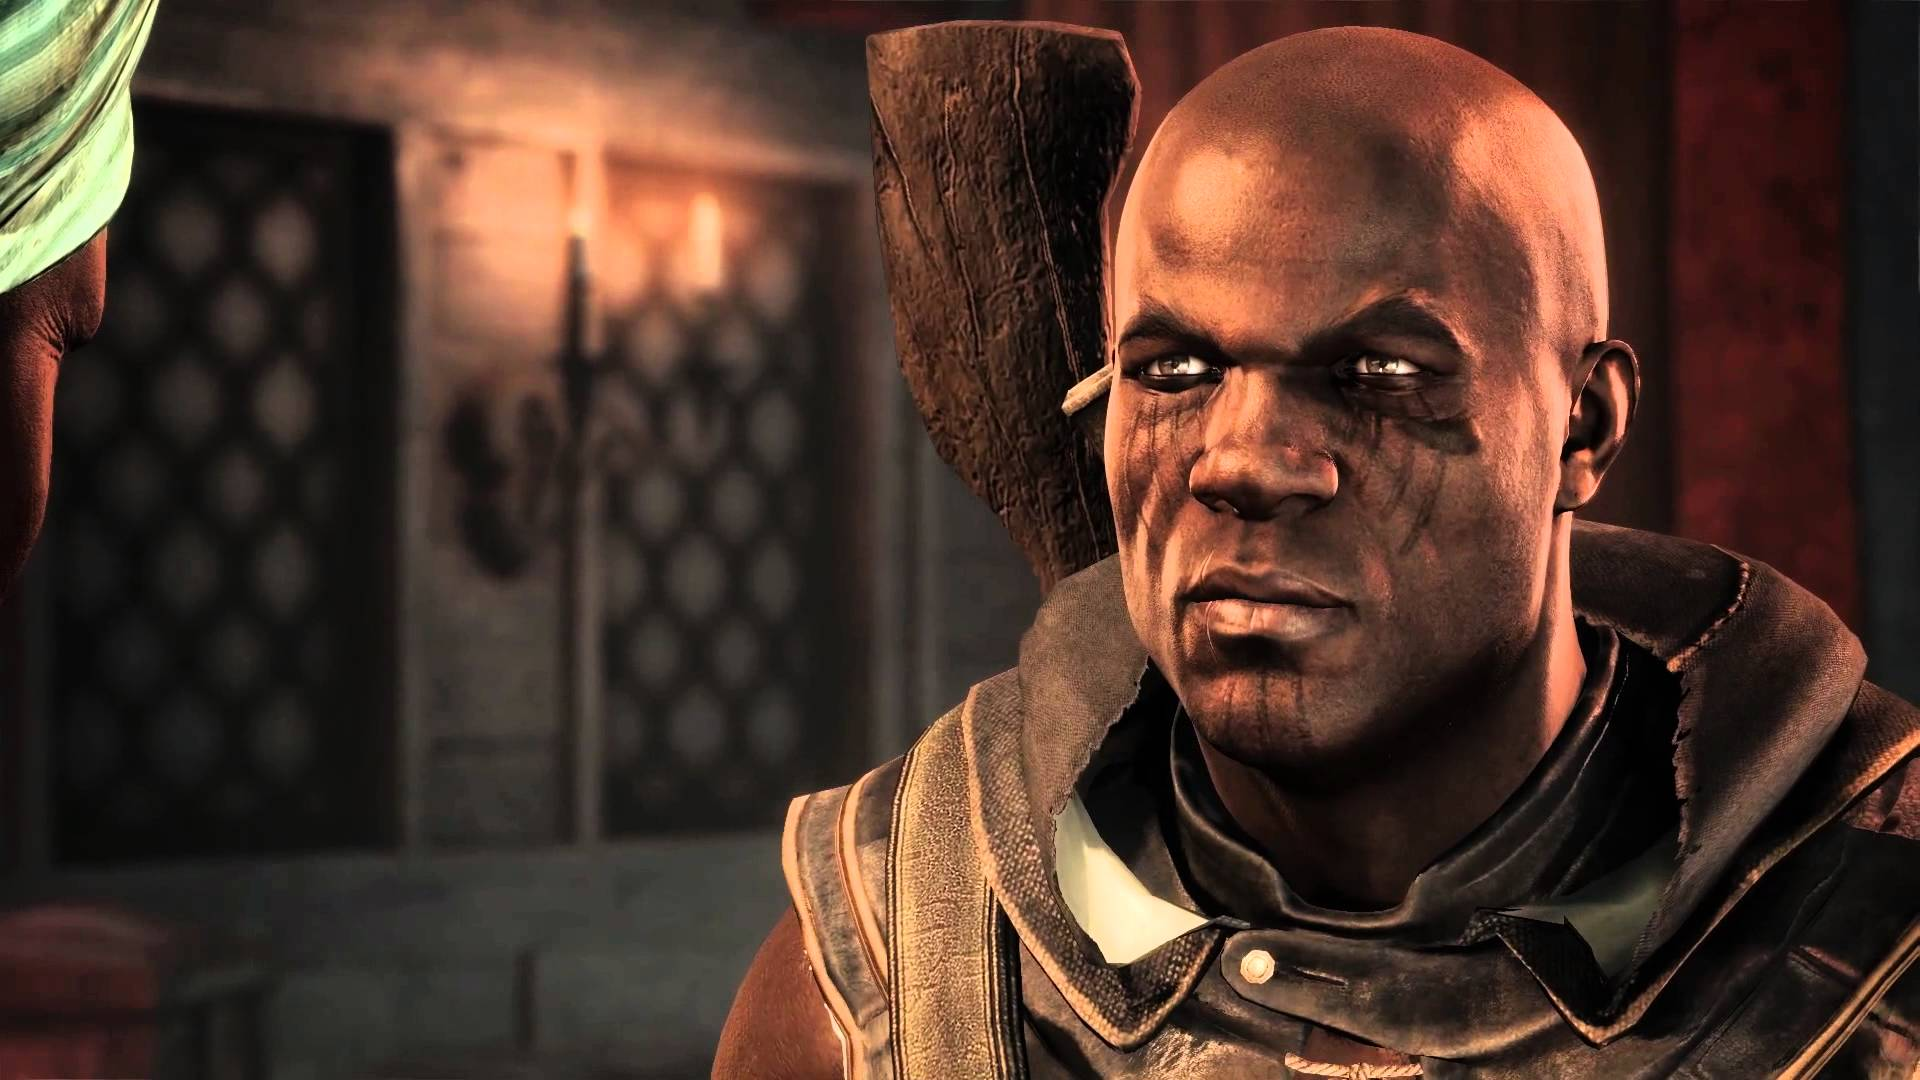 Trailer de lansare pentru Assassin's Creed 4: Black Flag – Freedom Cry